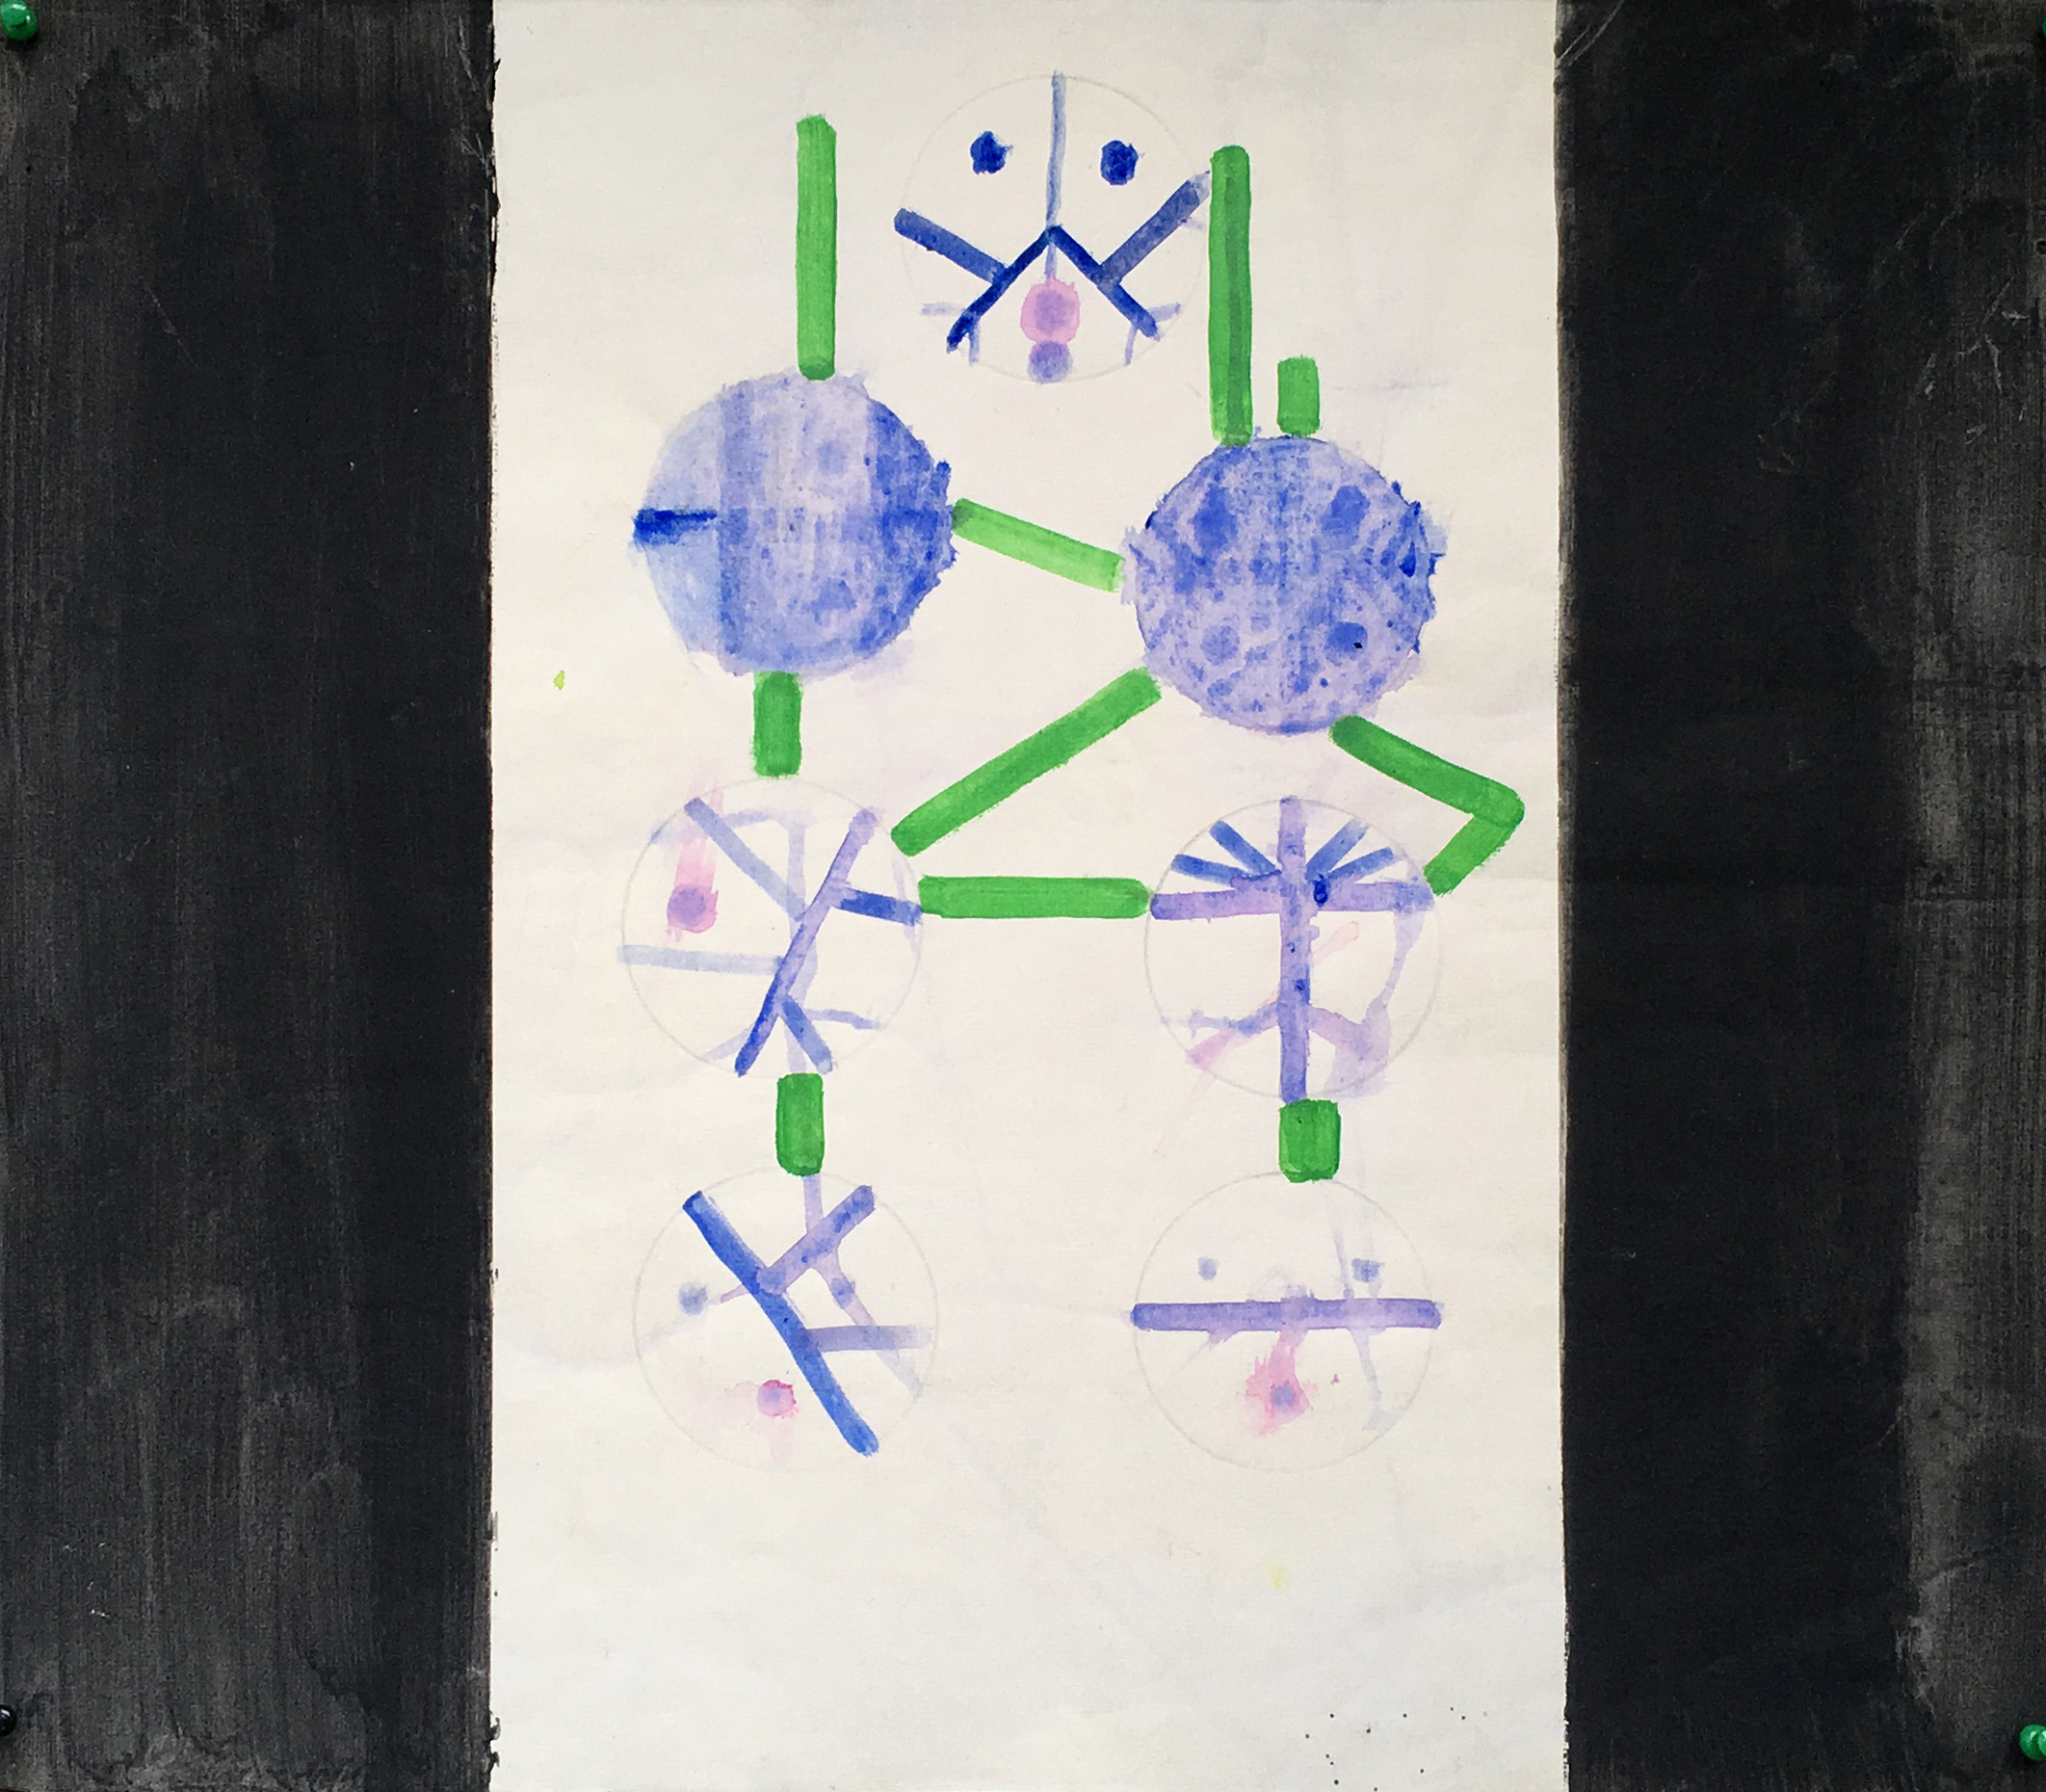 Untitled (bluegreen spheres)53x47cm